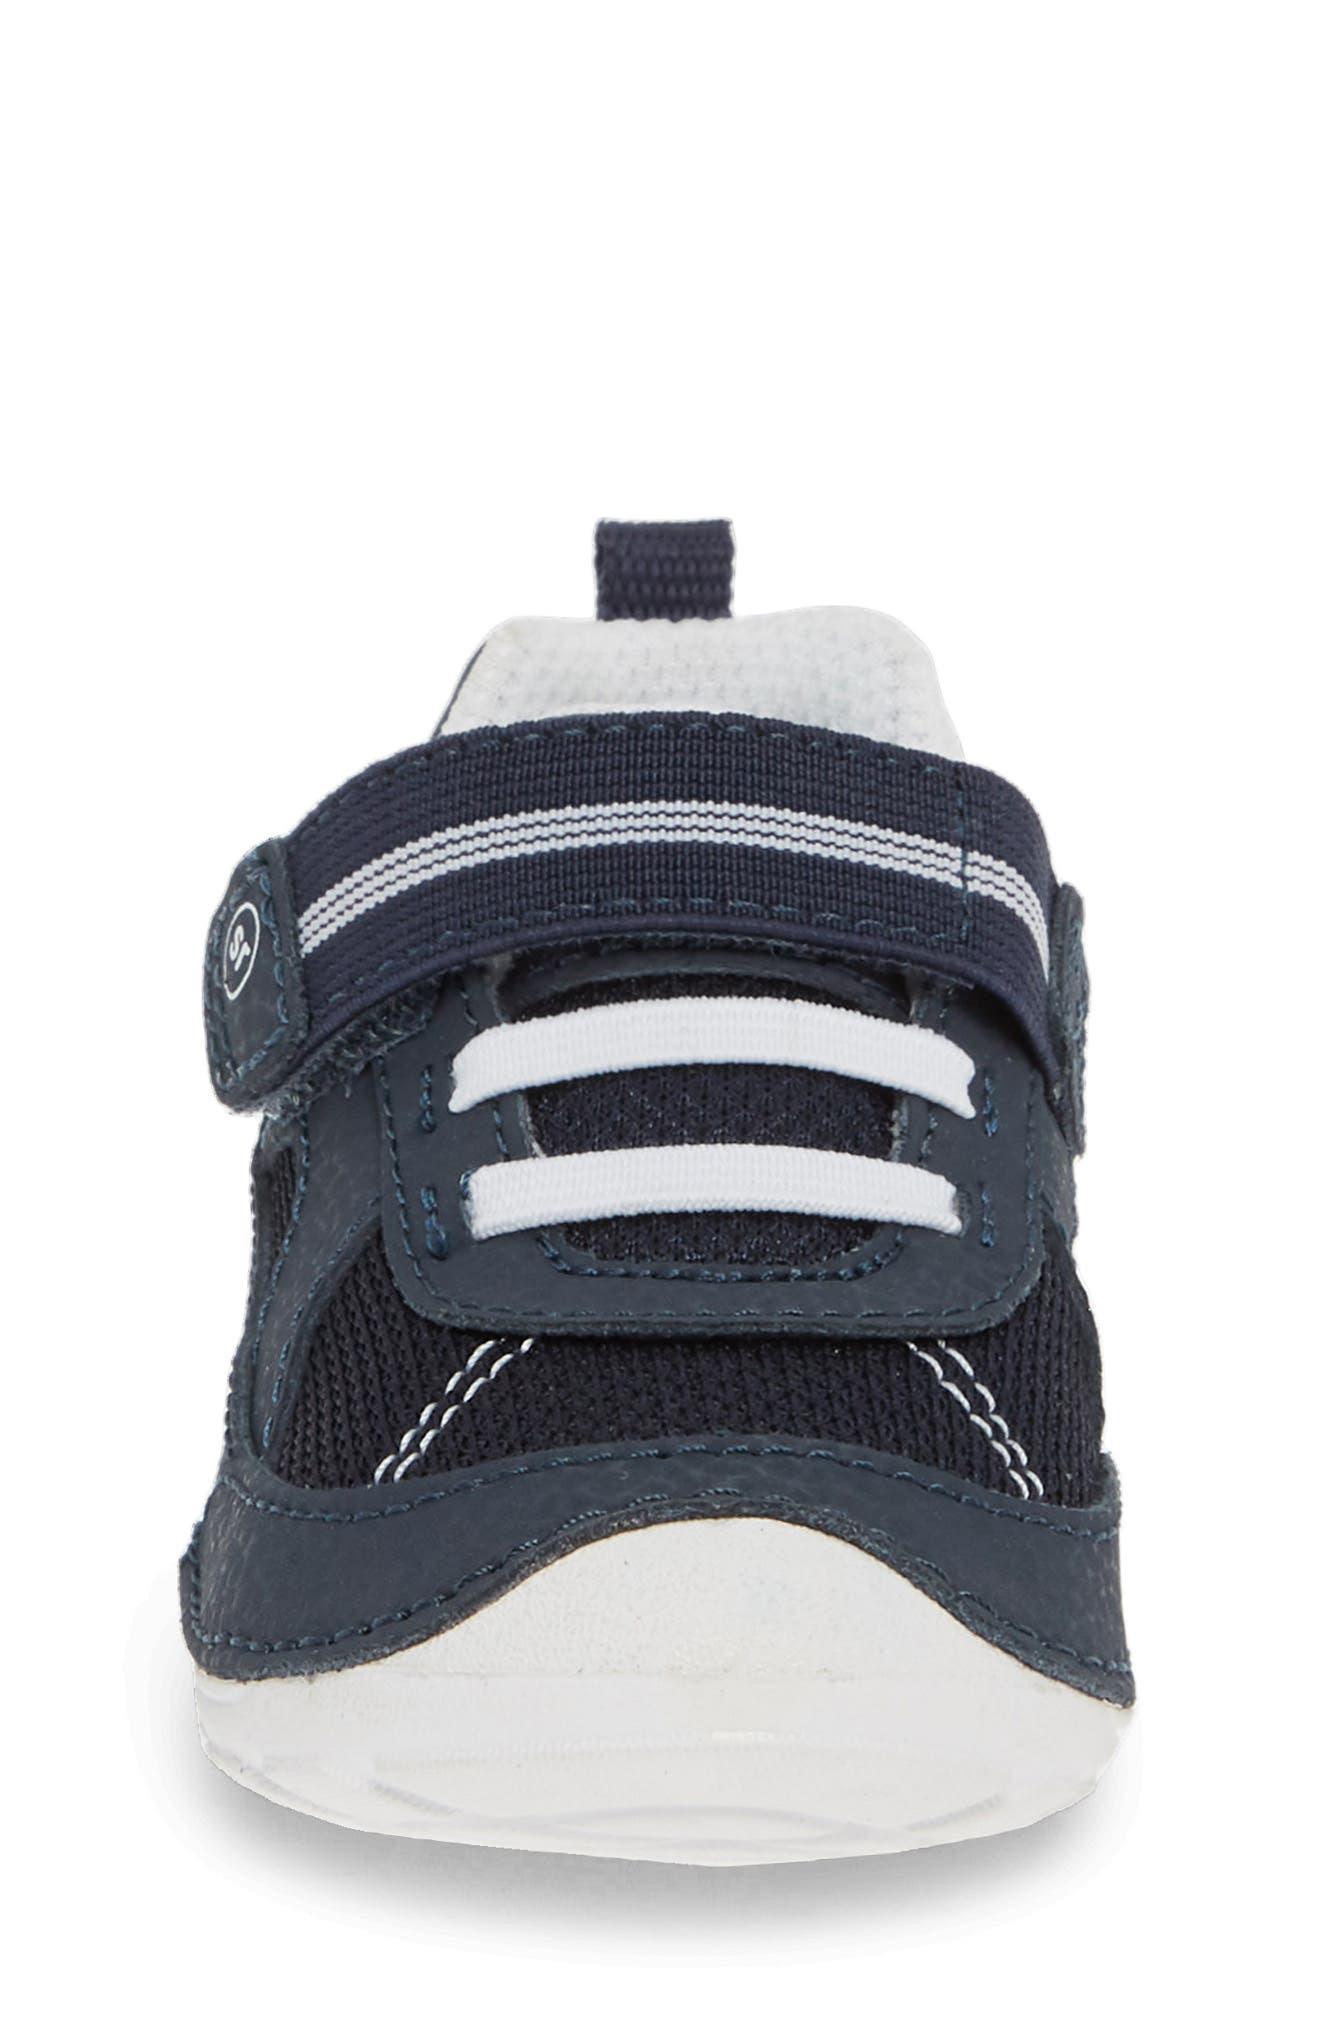 STRIDE RITE,                             Soft Motion<sup>™</sup> Jamie Sneaker,                             Alternate thumbnail 4, color,                             NAVY/ WHITE